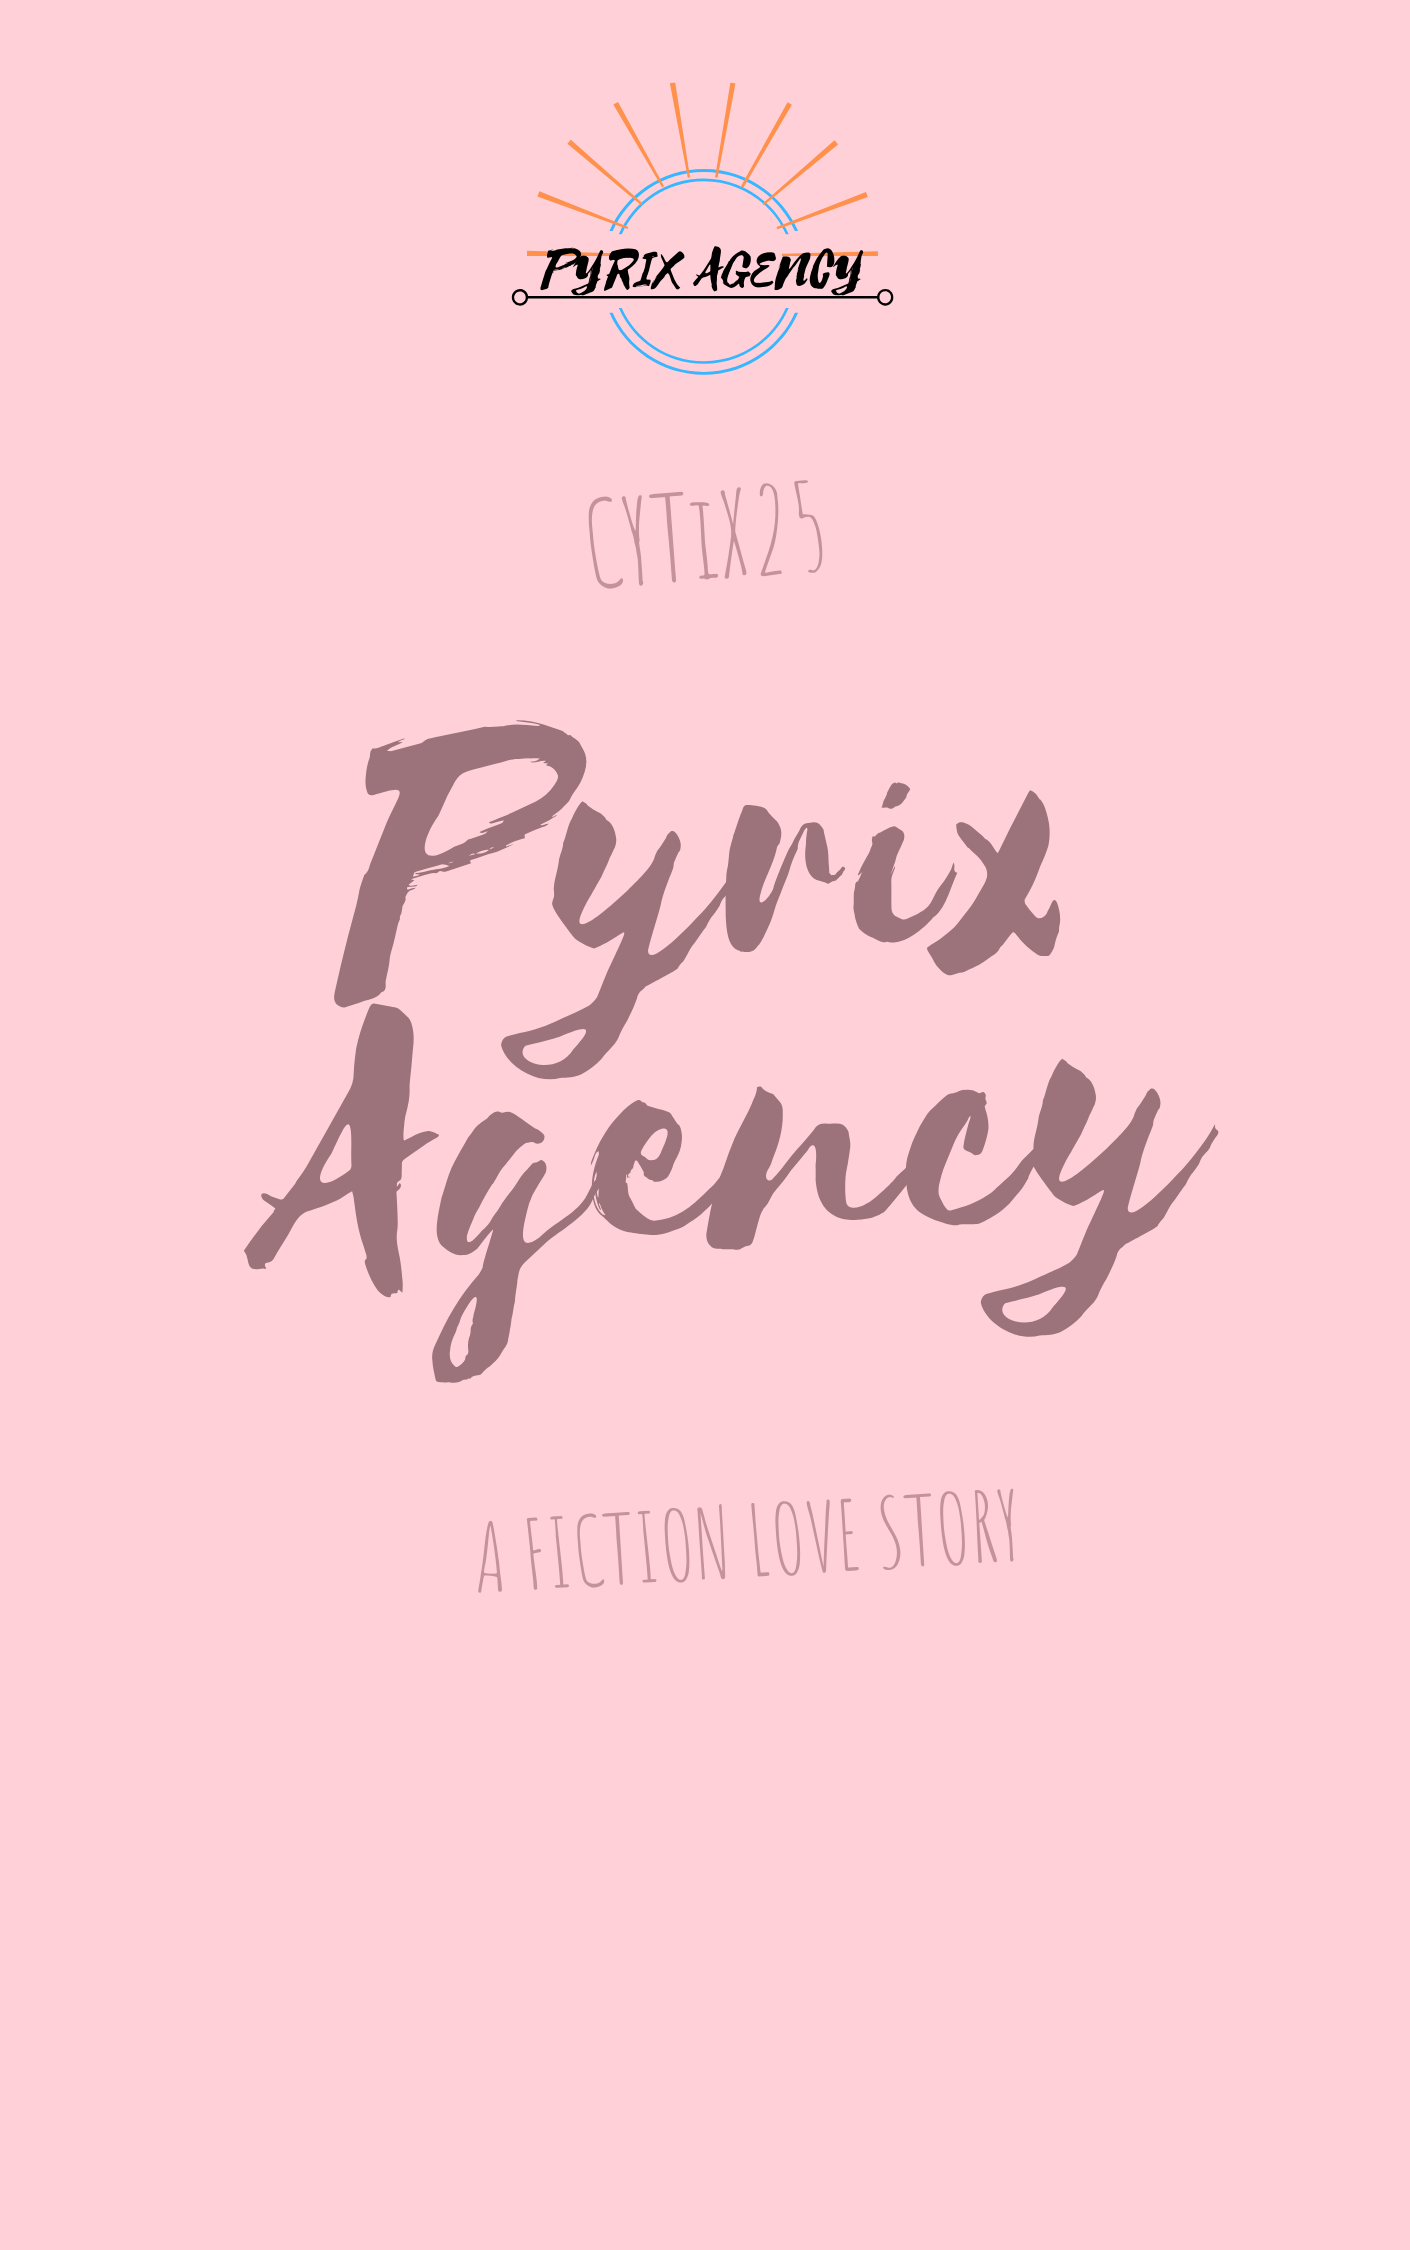 PYRIX AGENCY